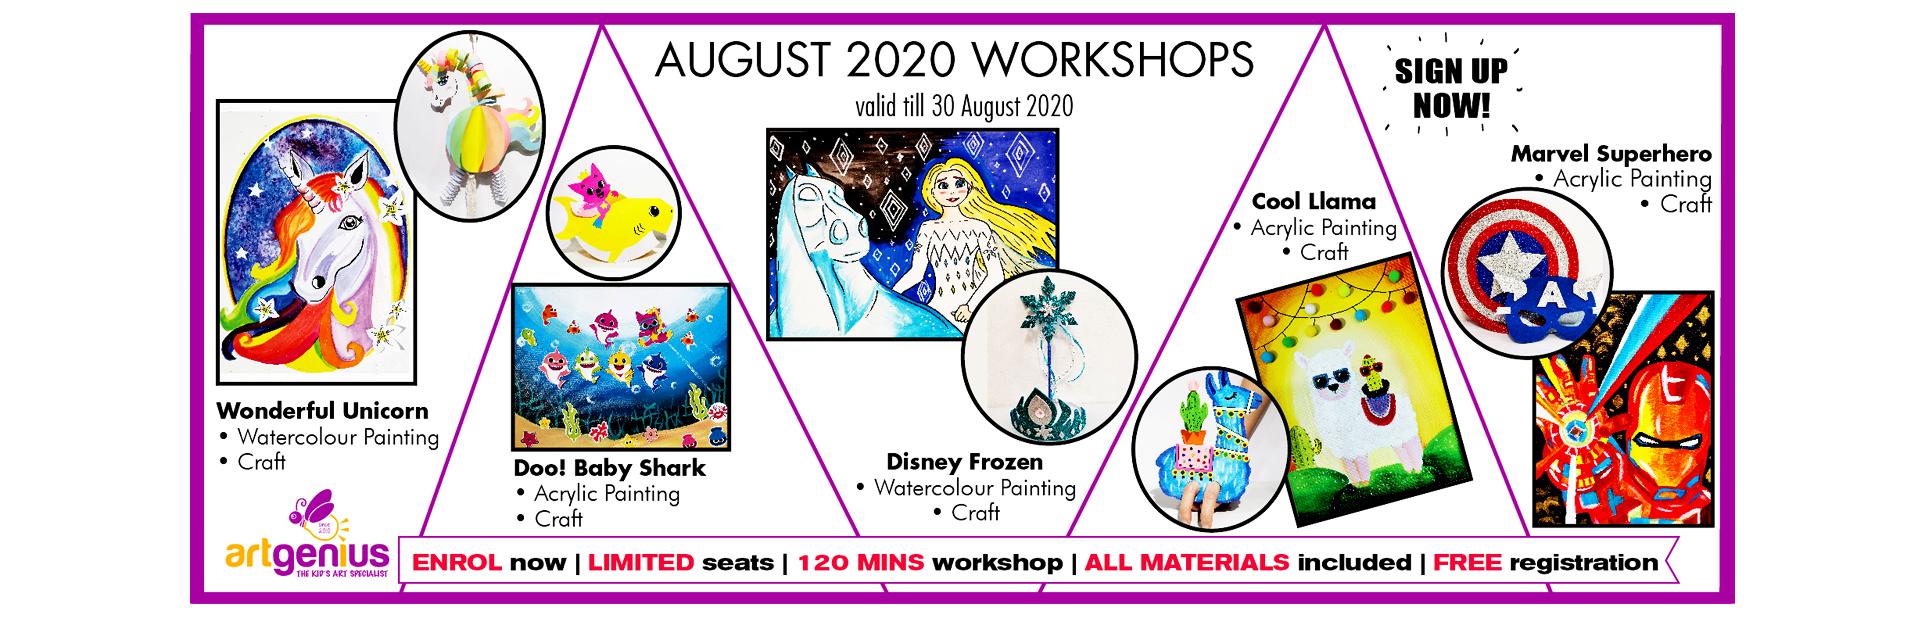 August-2020-Workshop-web-banner